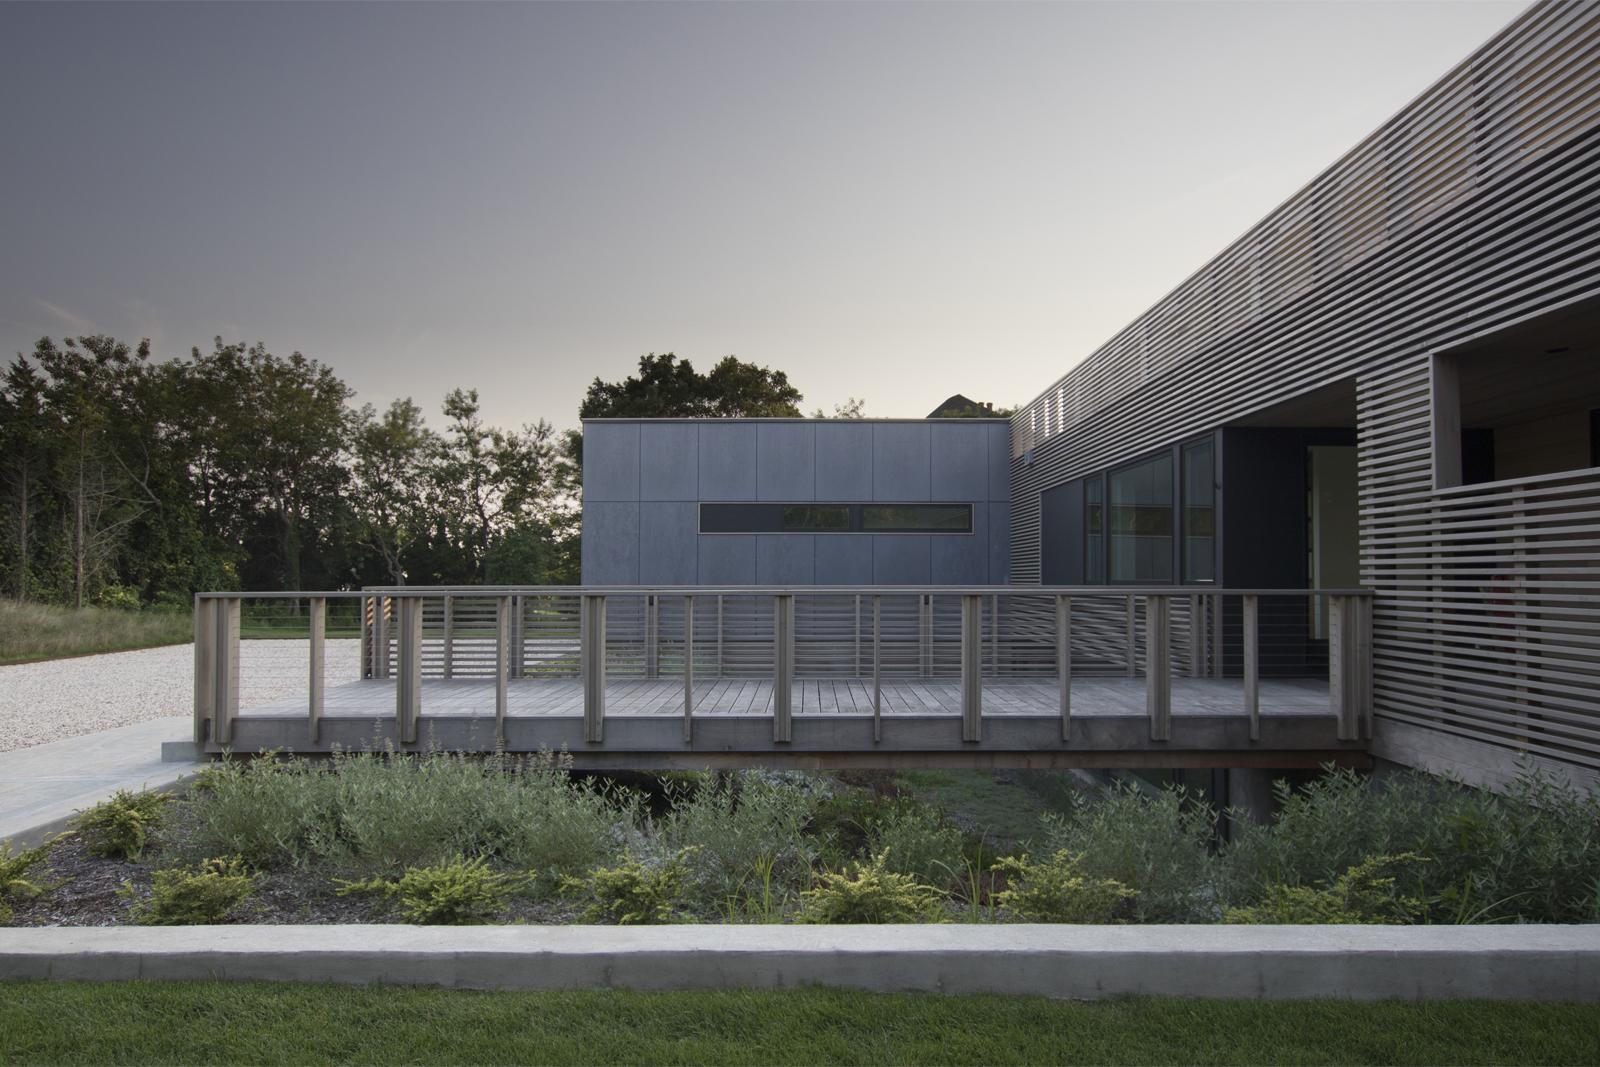 11-res4-resolution-4-architecture-modern-modular-house-prefab-home-north-fork-bluff-house-exterior-facade-elevation-bridge-entry-dusk.jpg